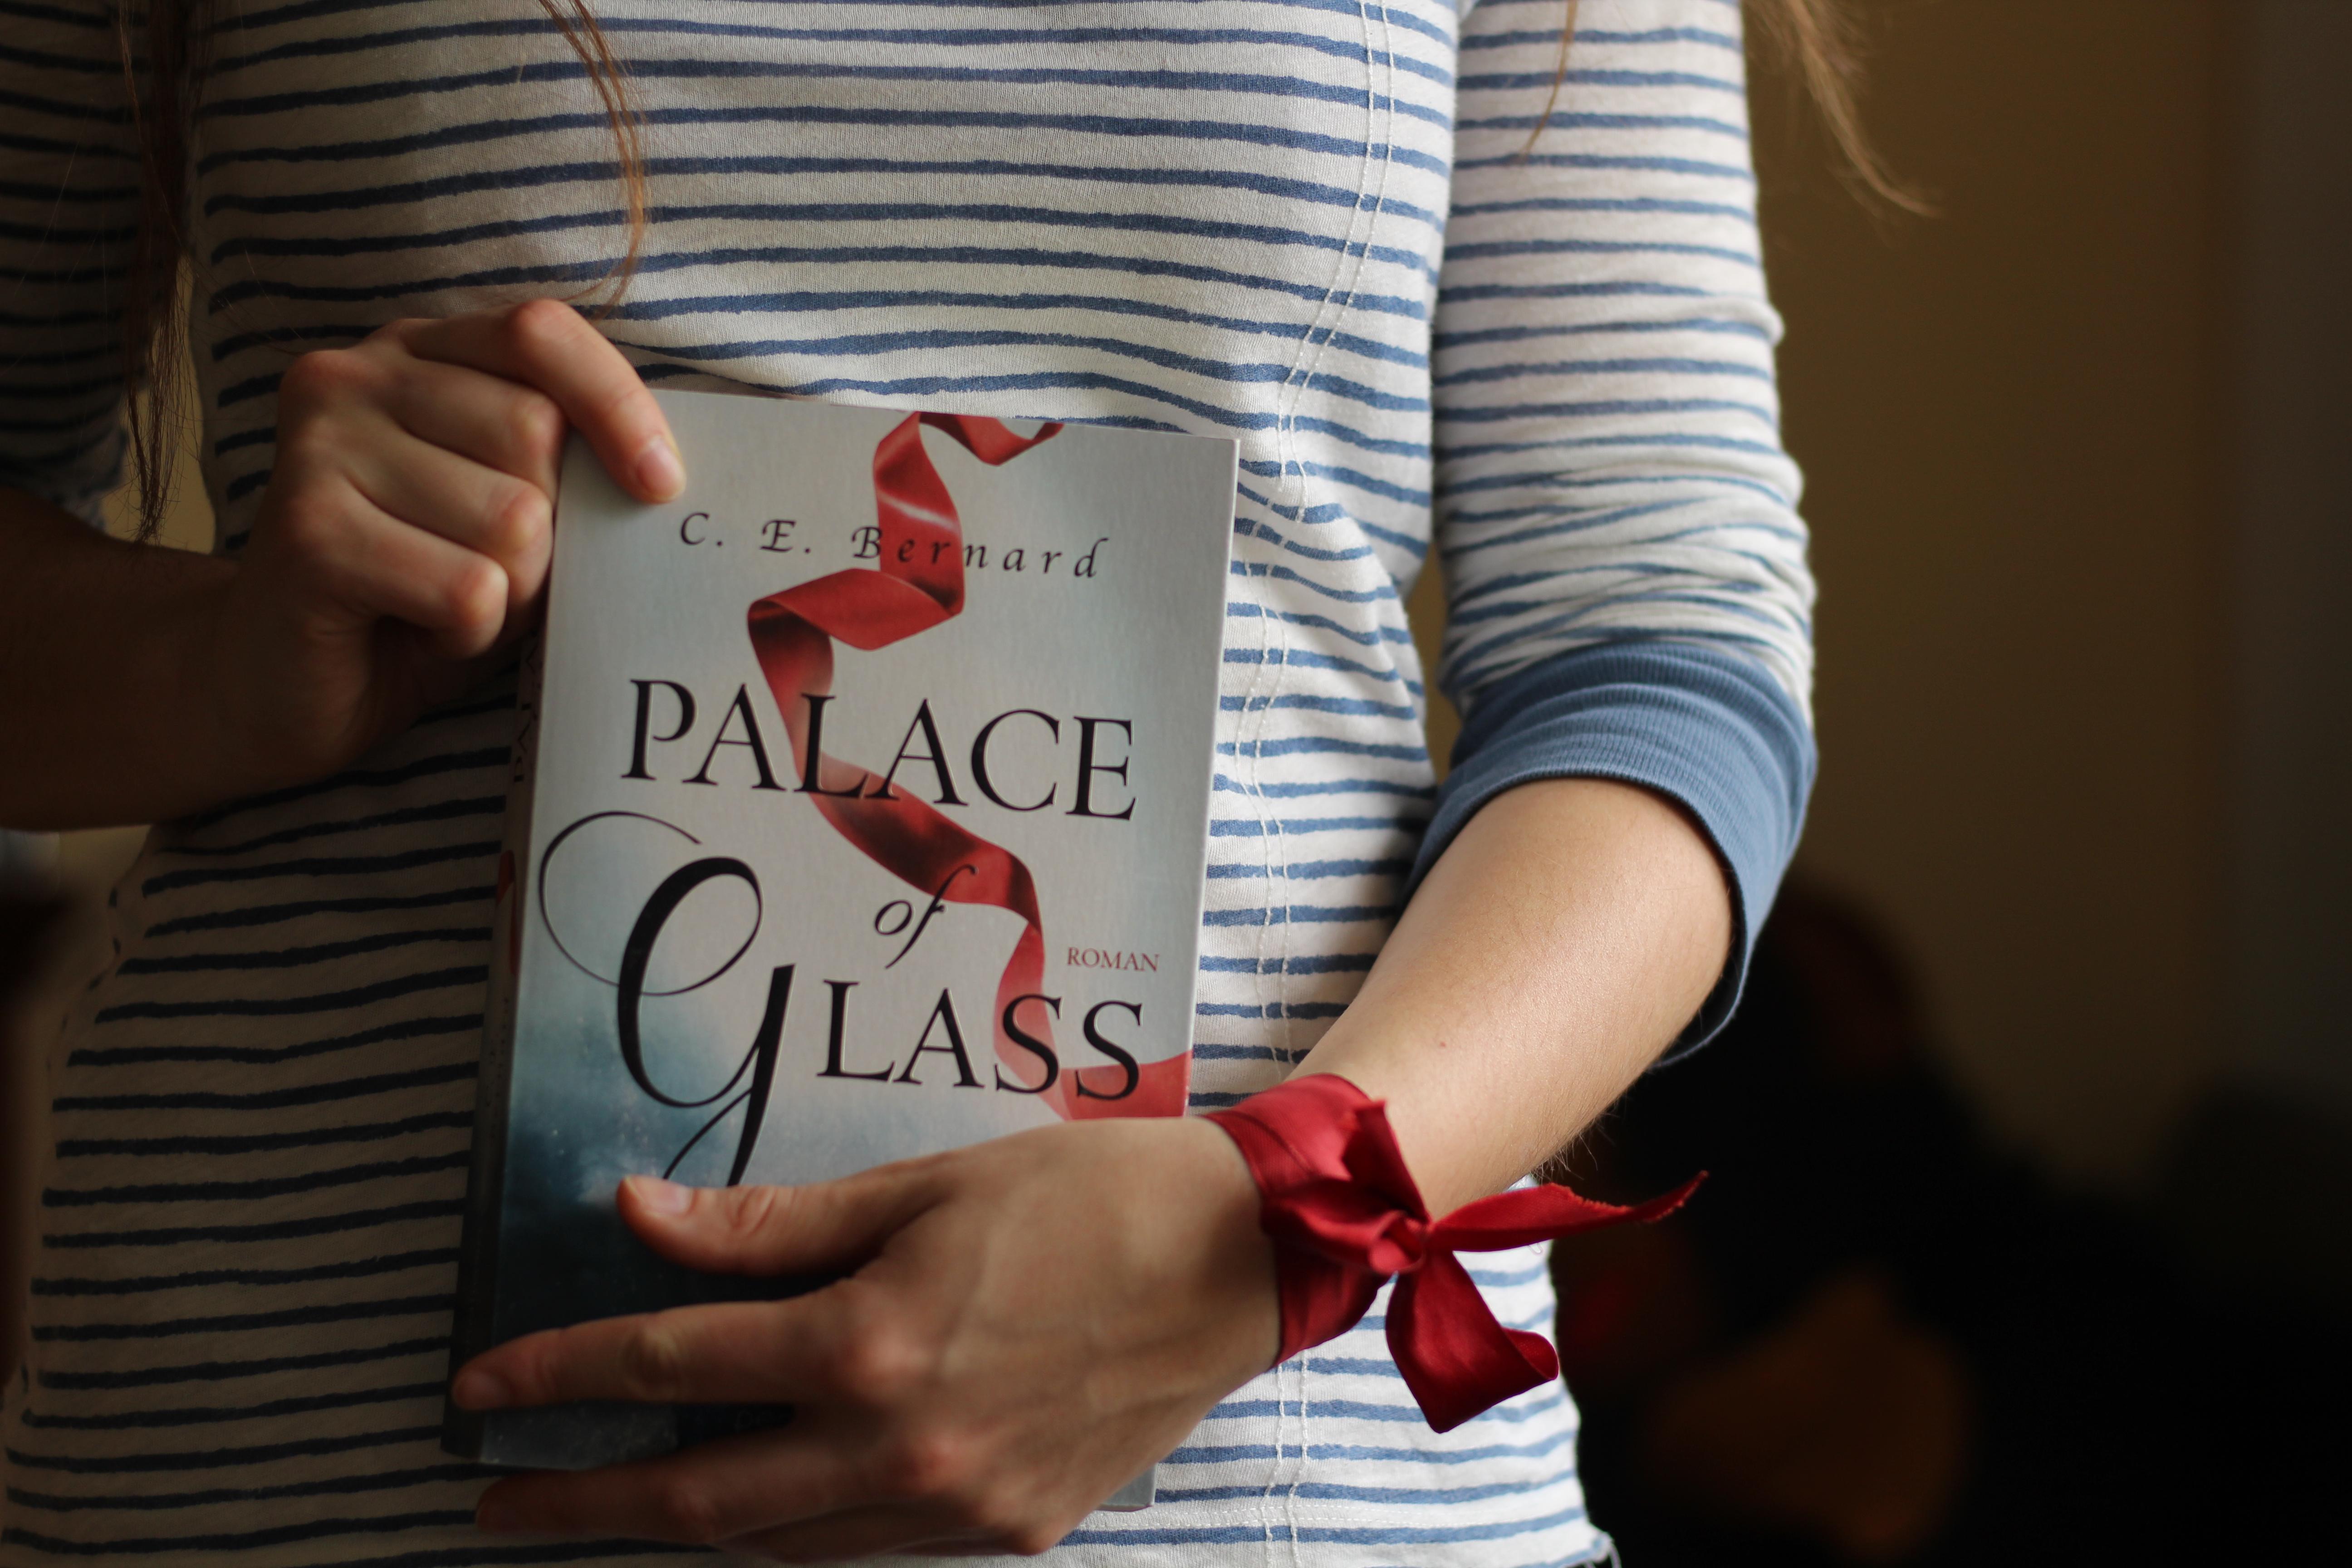 Palace of Glass, C.E. Bernard